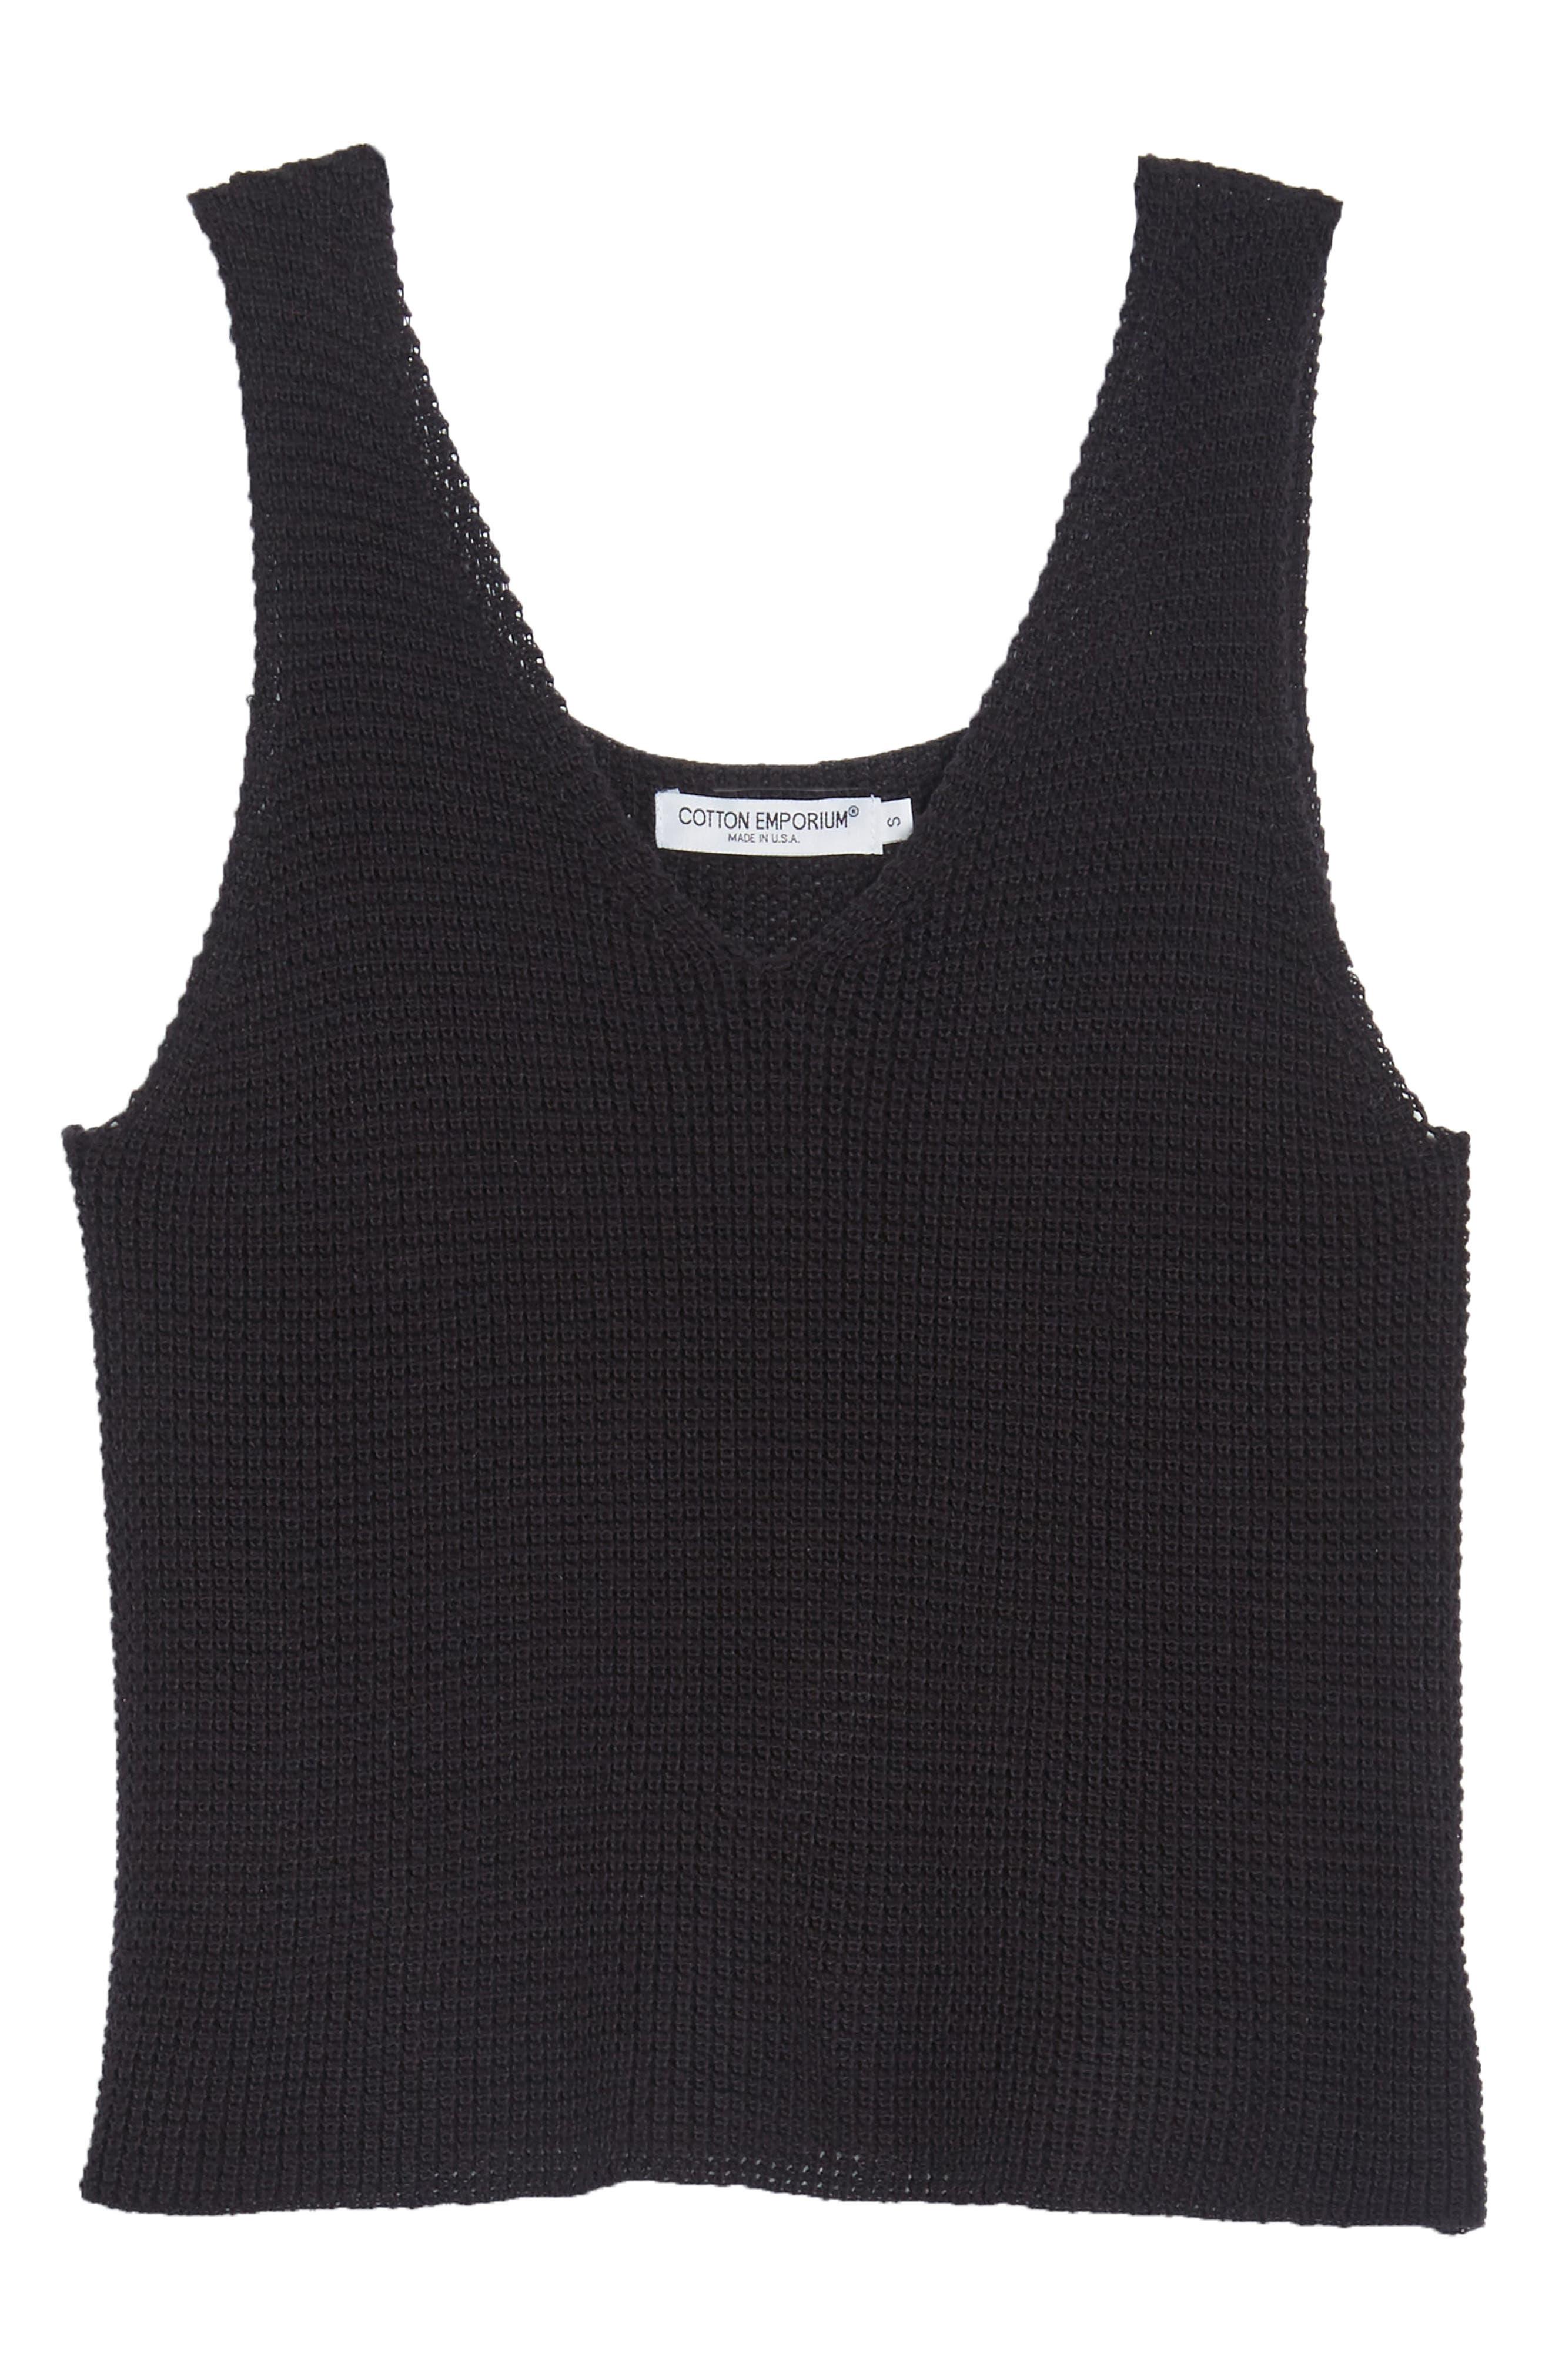 COTTON EMPORIUM,                             Sweater Tank Top,                             Alternate thumbnail 7, color,                             001